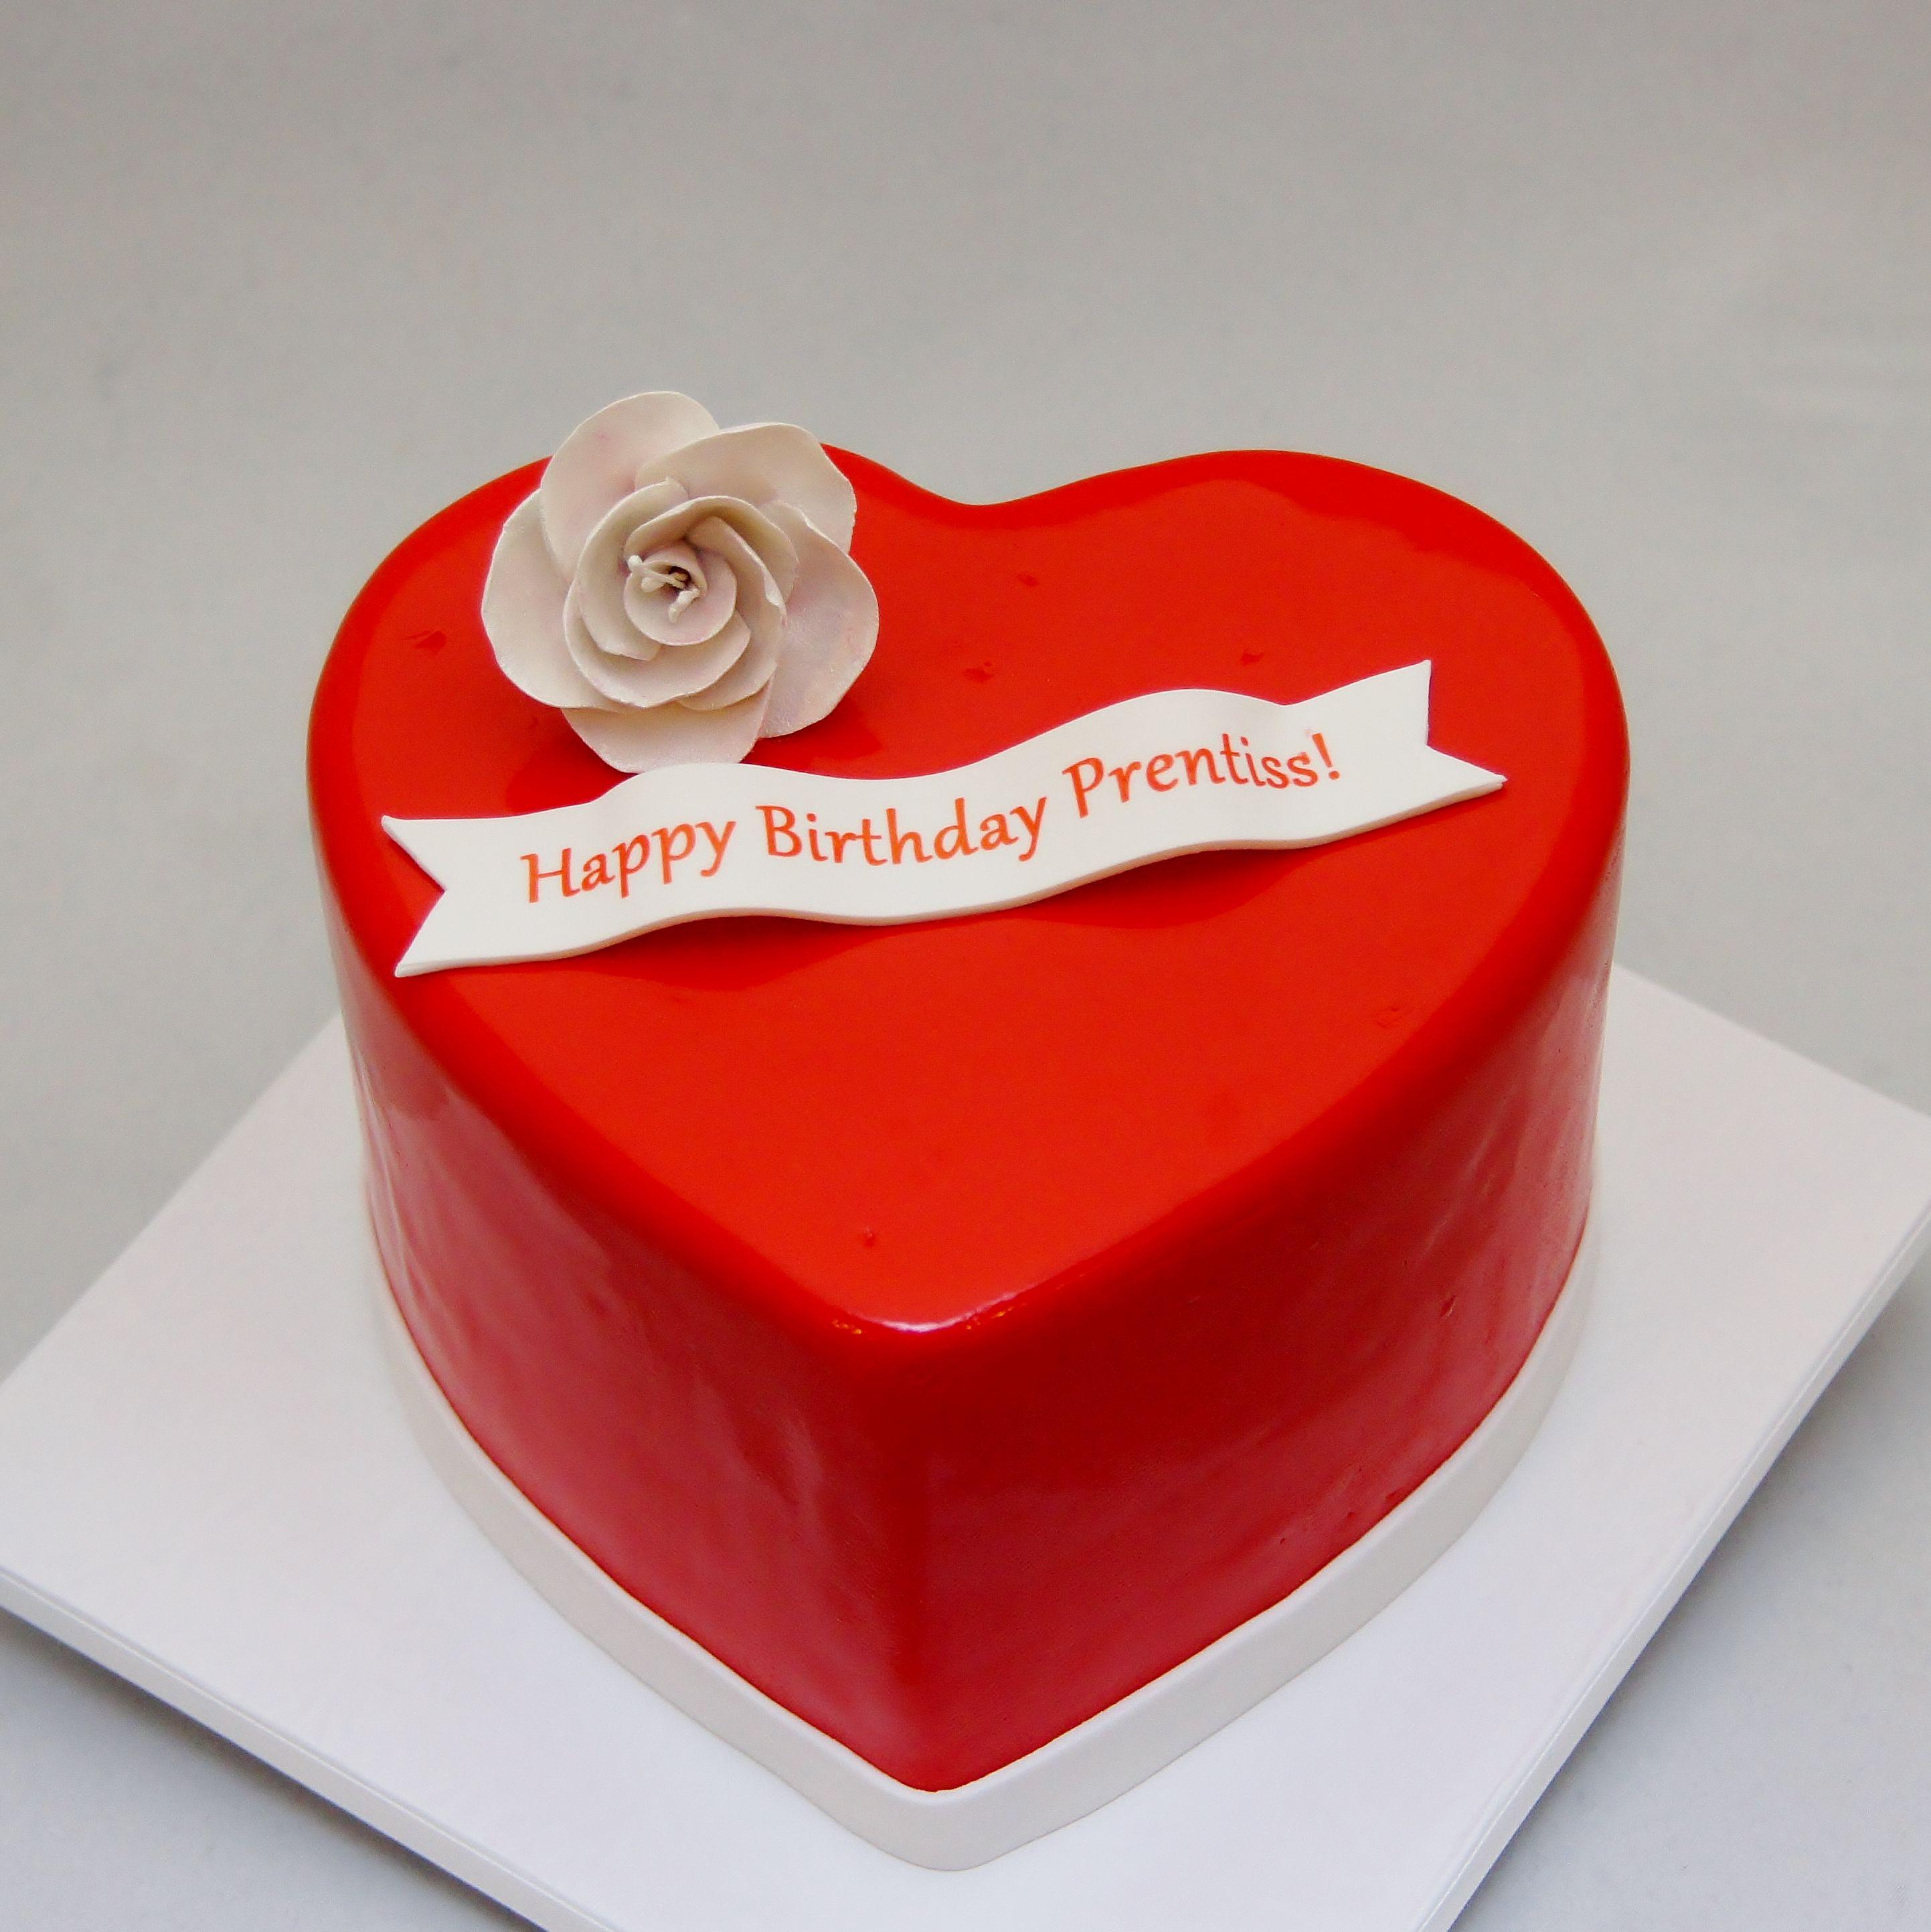 3D Heart Birthday Cake | 3D Cakes in 2019 | Heart birthday